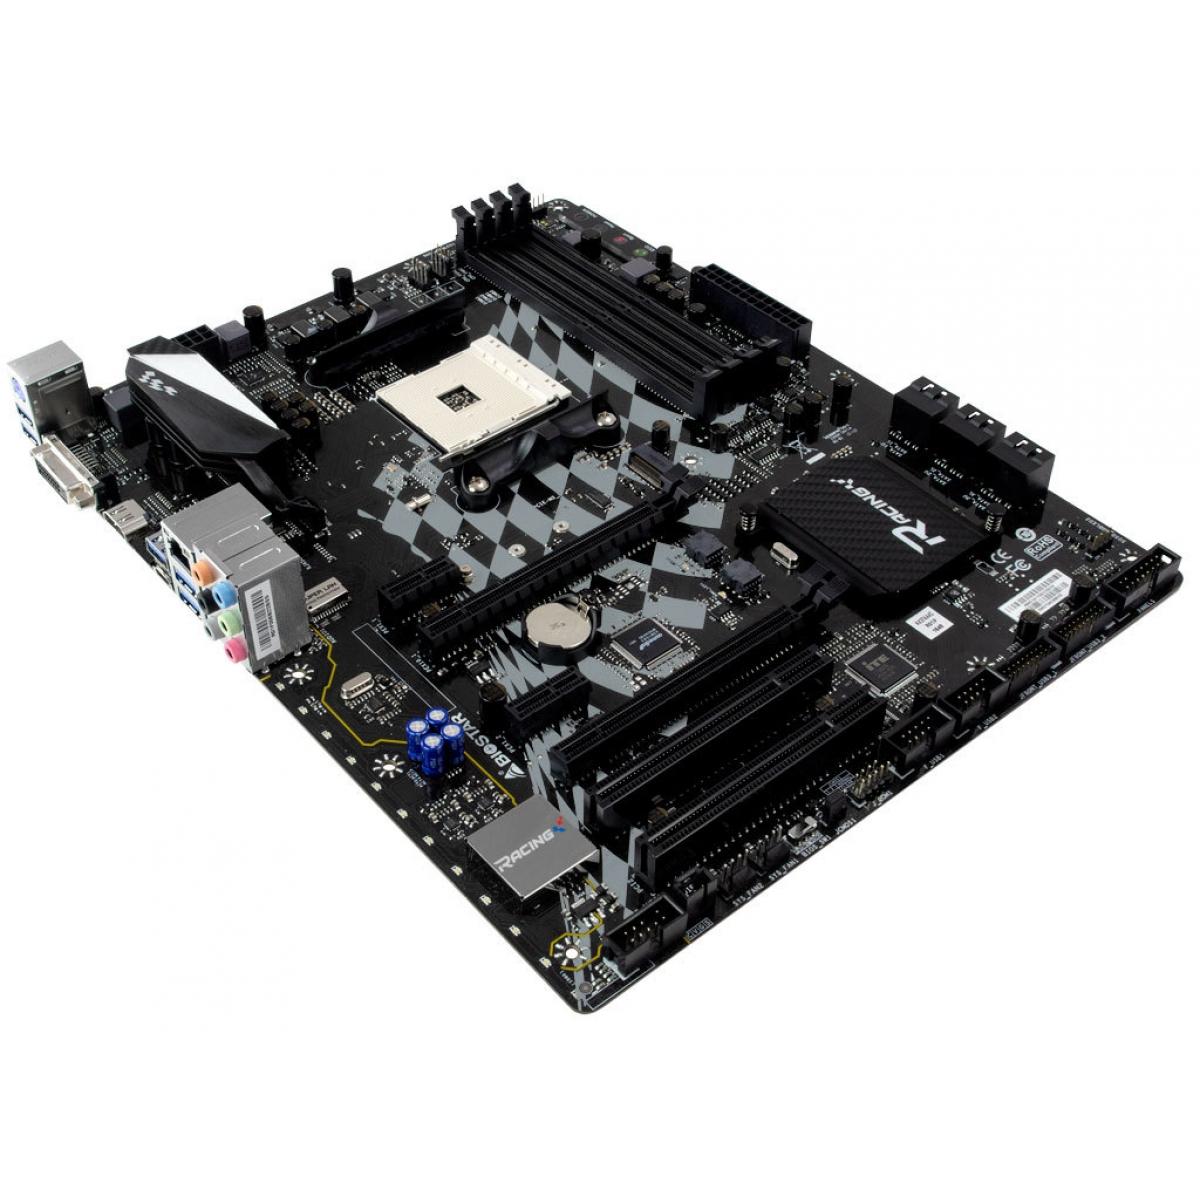 Placa Mãe Biostar Racing X370GT5, Chipset X370, AMD AM4, ATX, DDR4